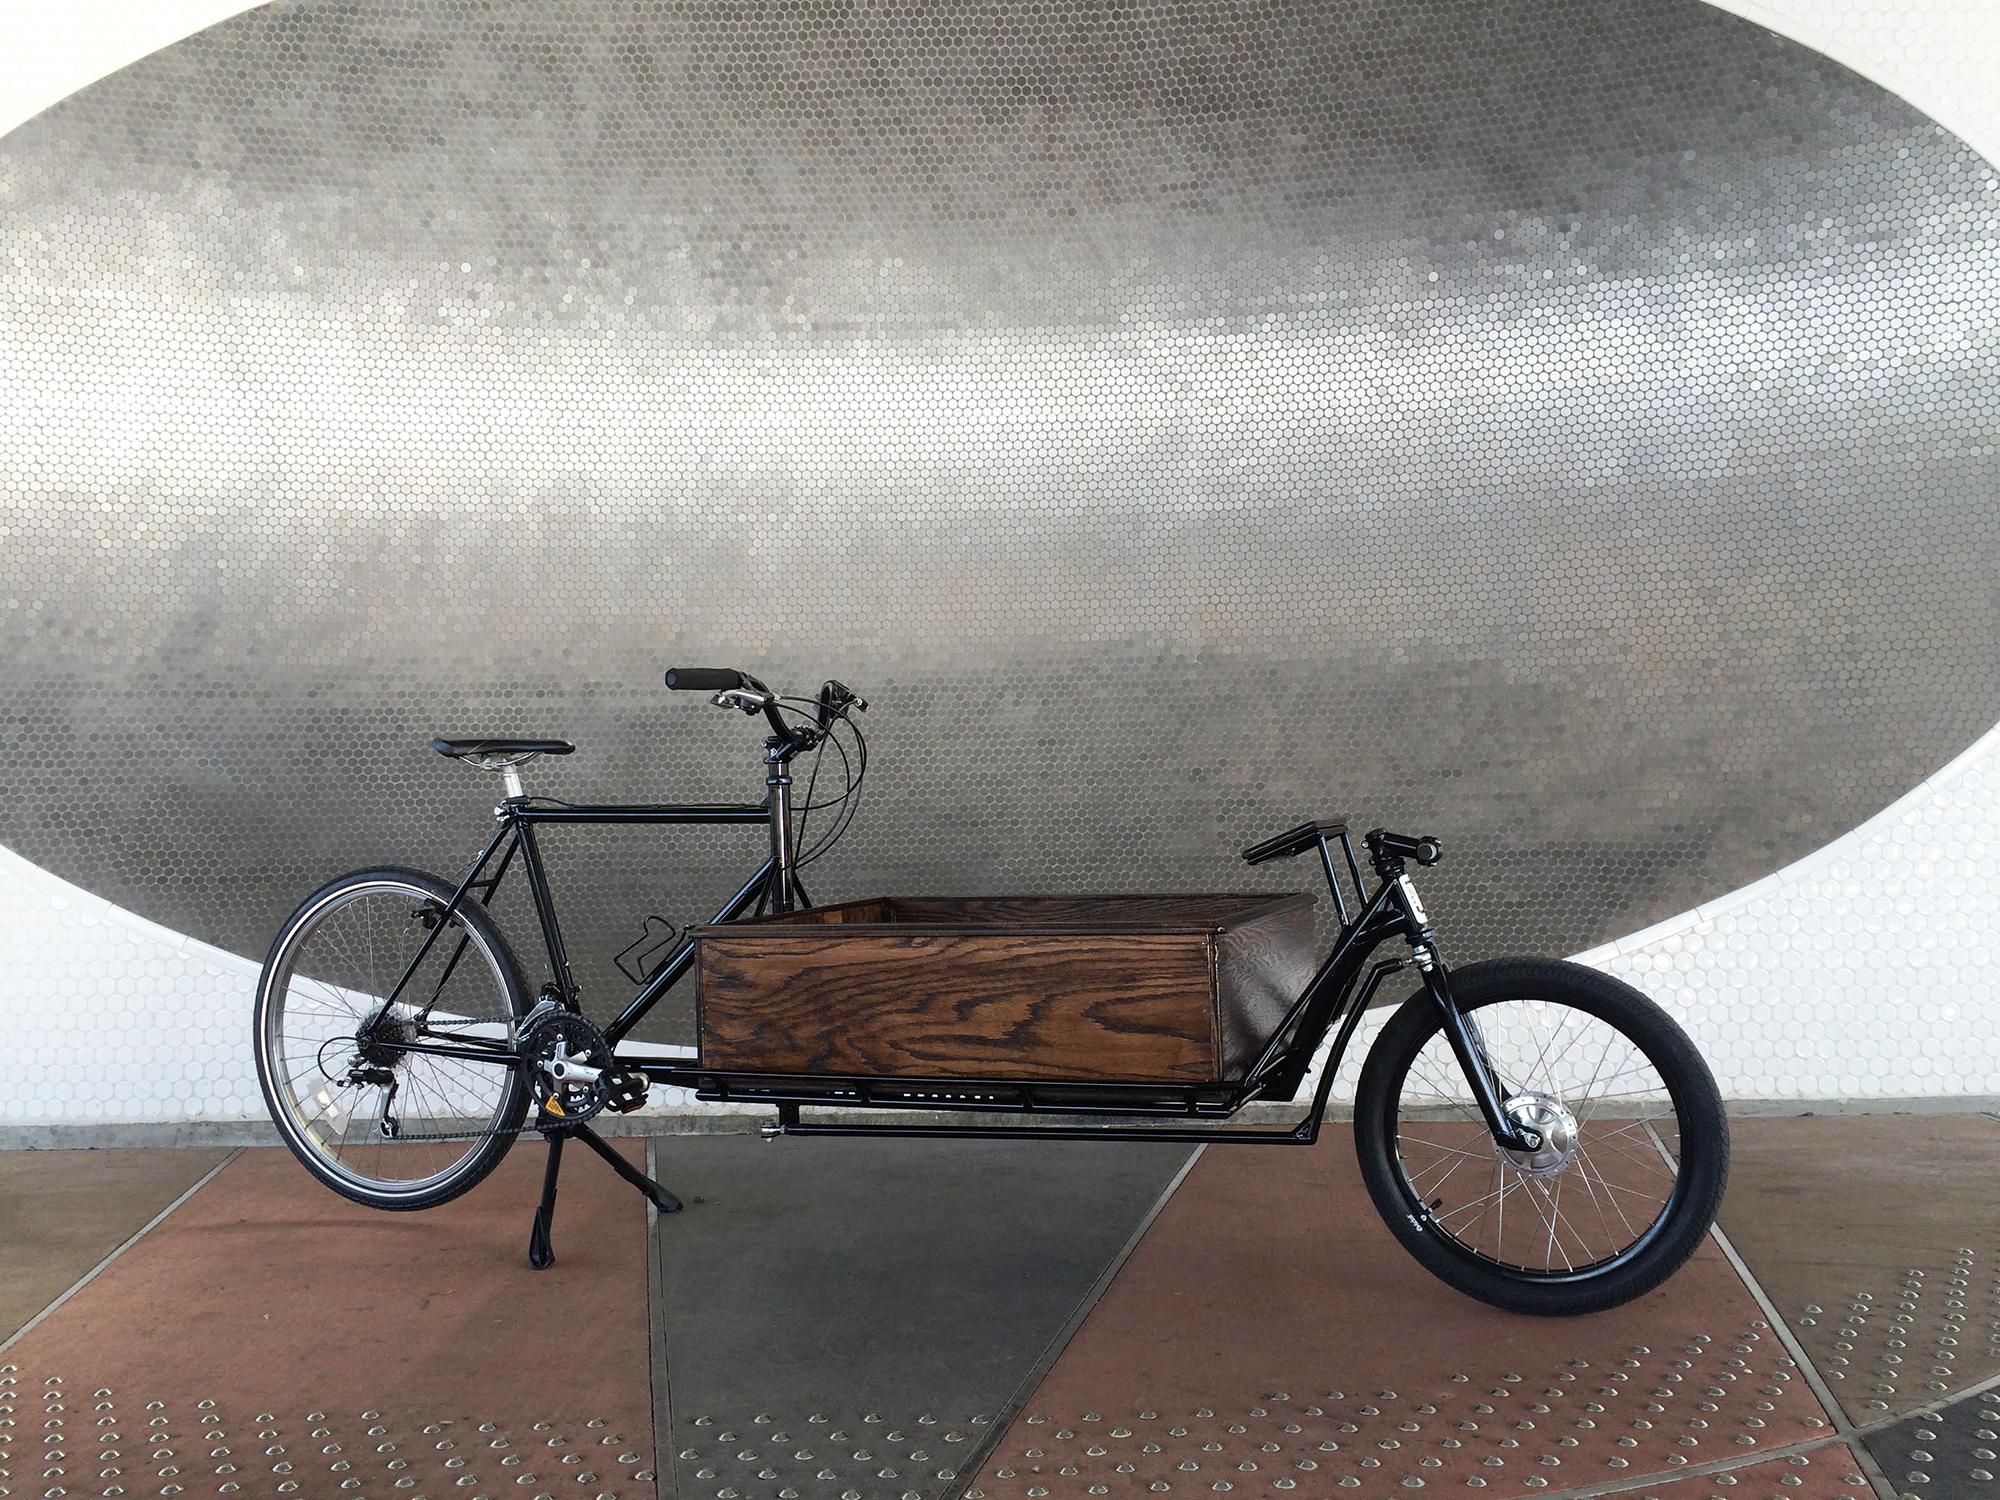 cargobike portland pdx retrofiet fietsofstrength bakfiets boxbike